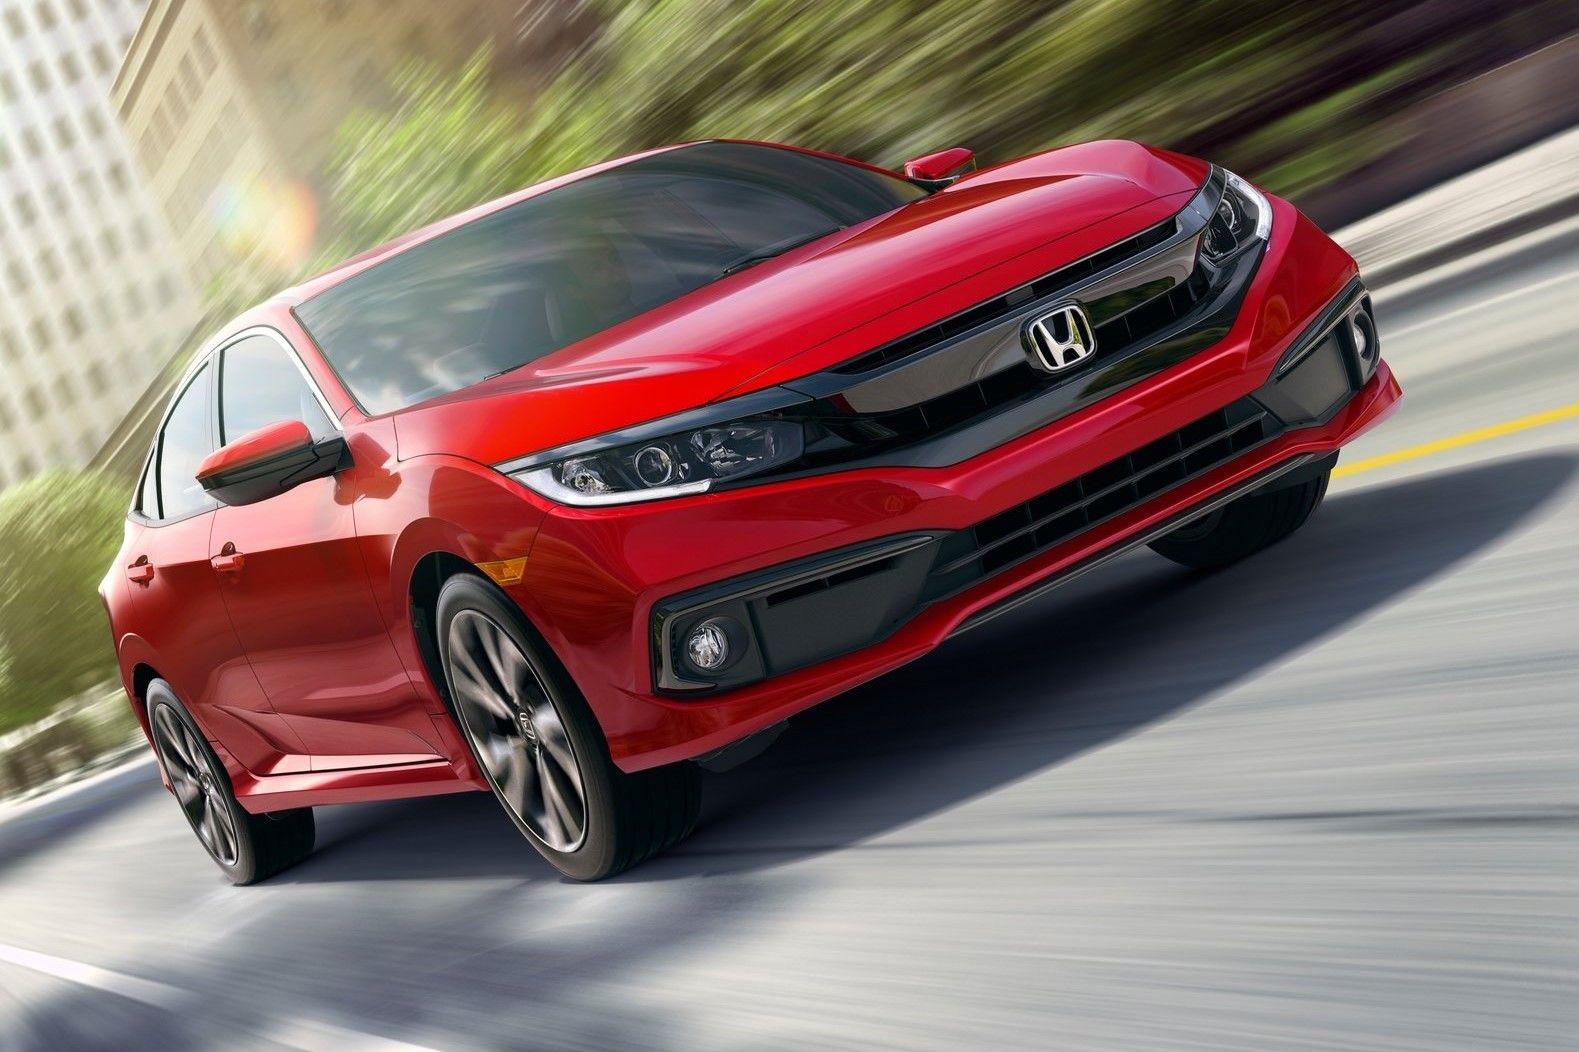 The 2019 Honda Civic Sedan: Iconic Reliability and Efficiency